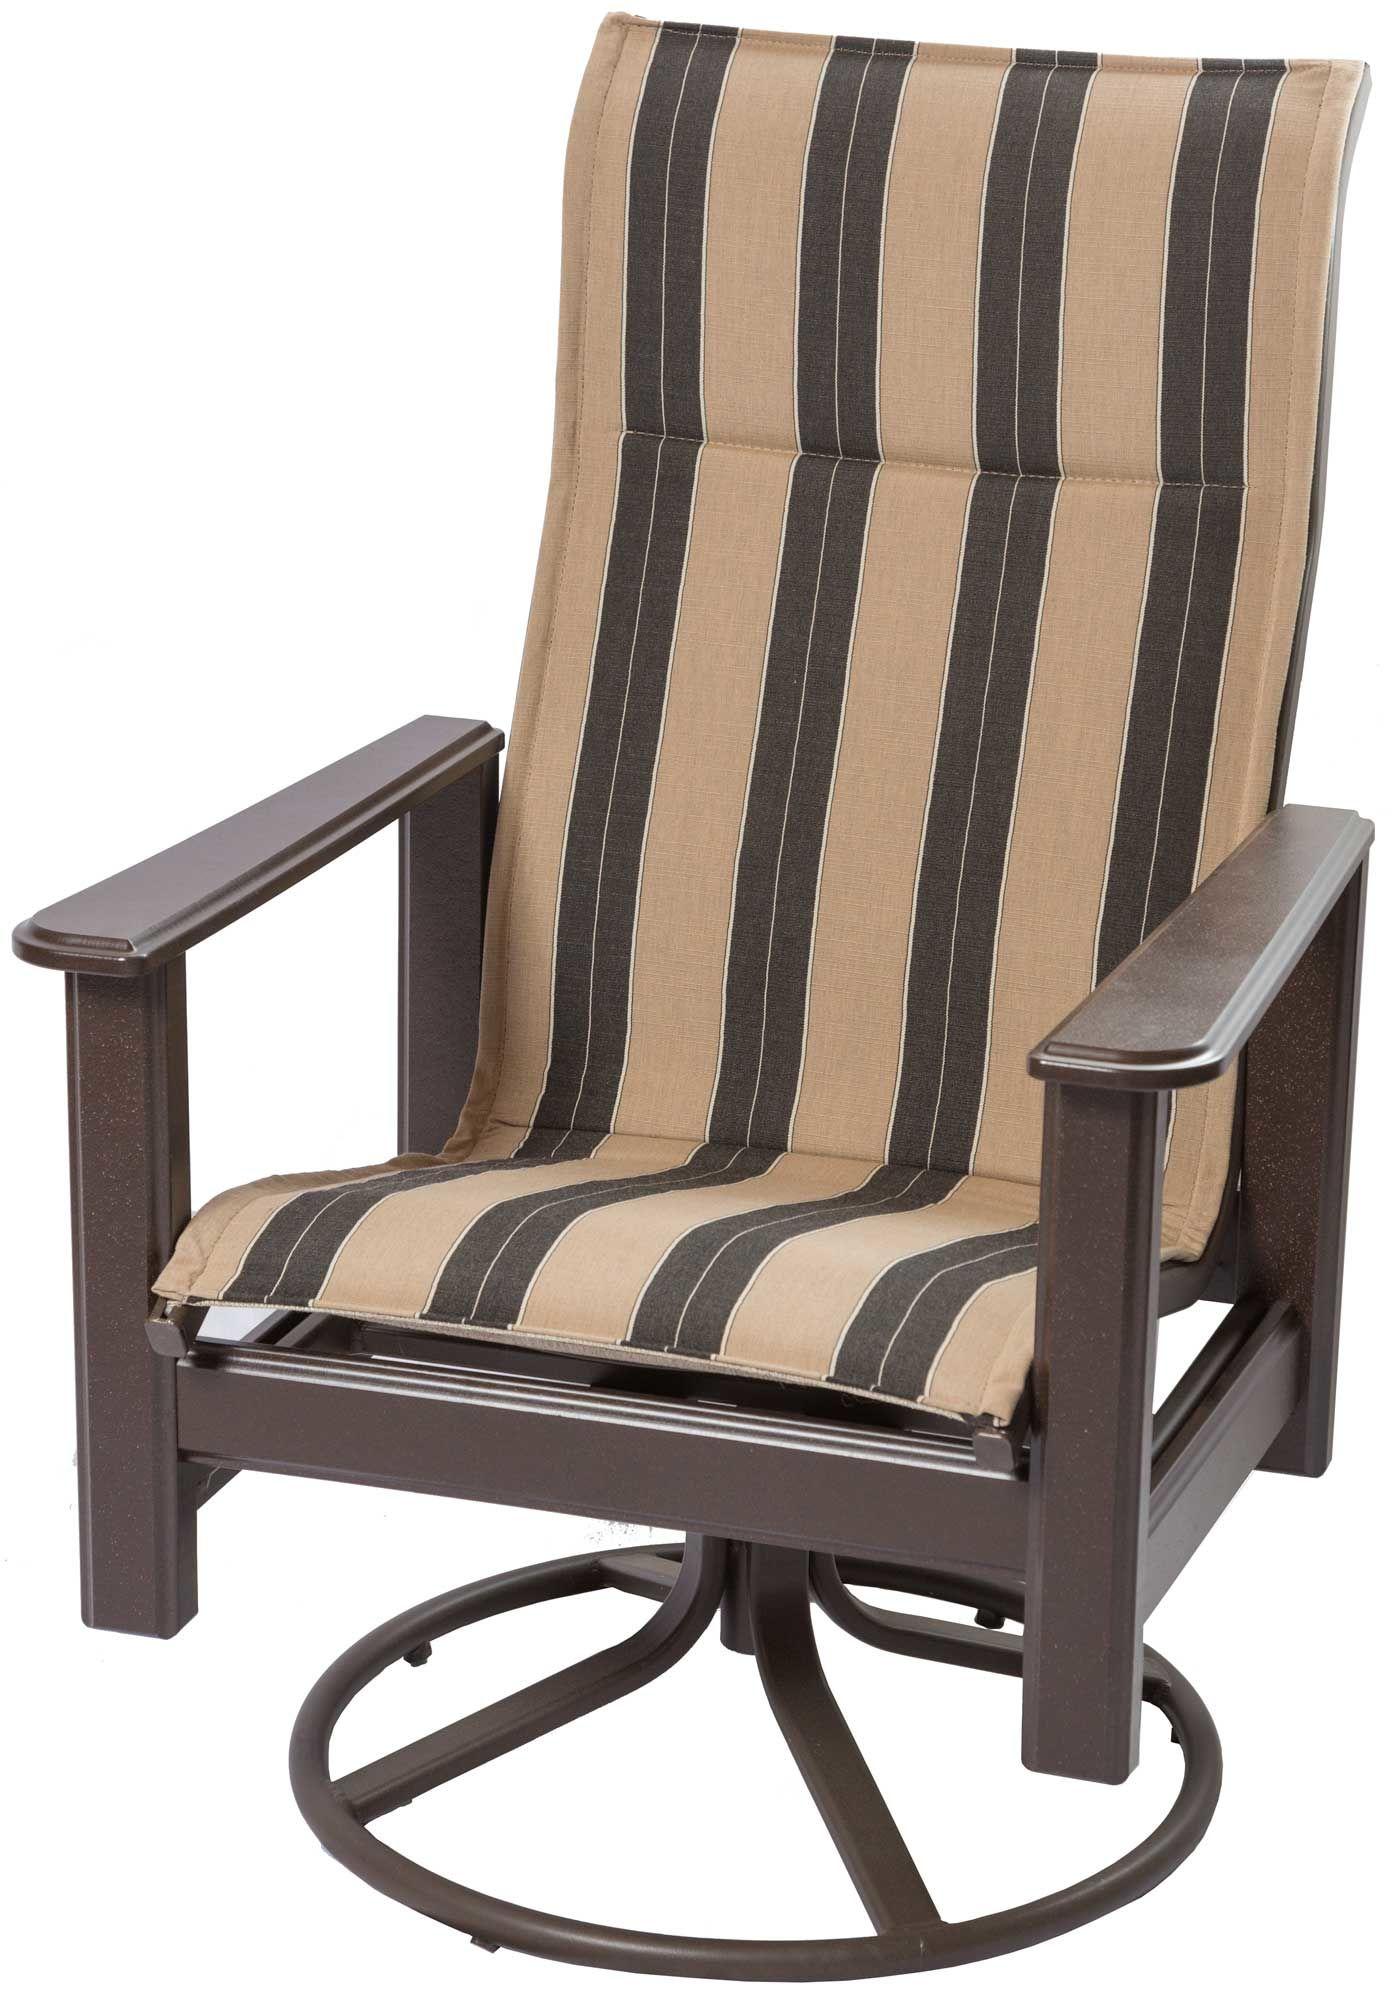 High Back Outdoor Swivel Rocker Outdoor Swivel Rocking Chair